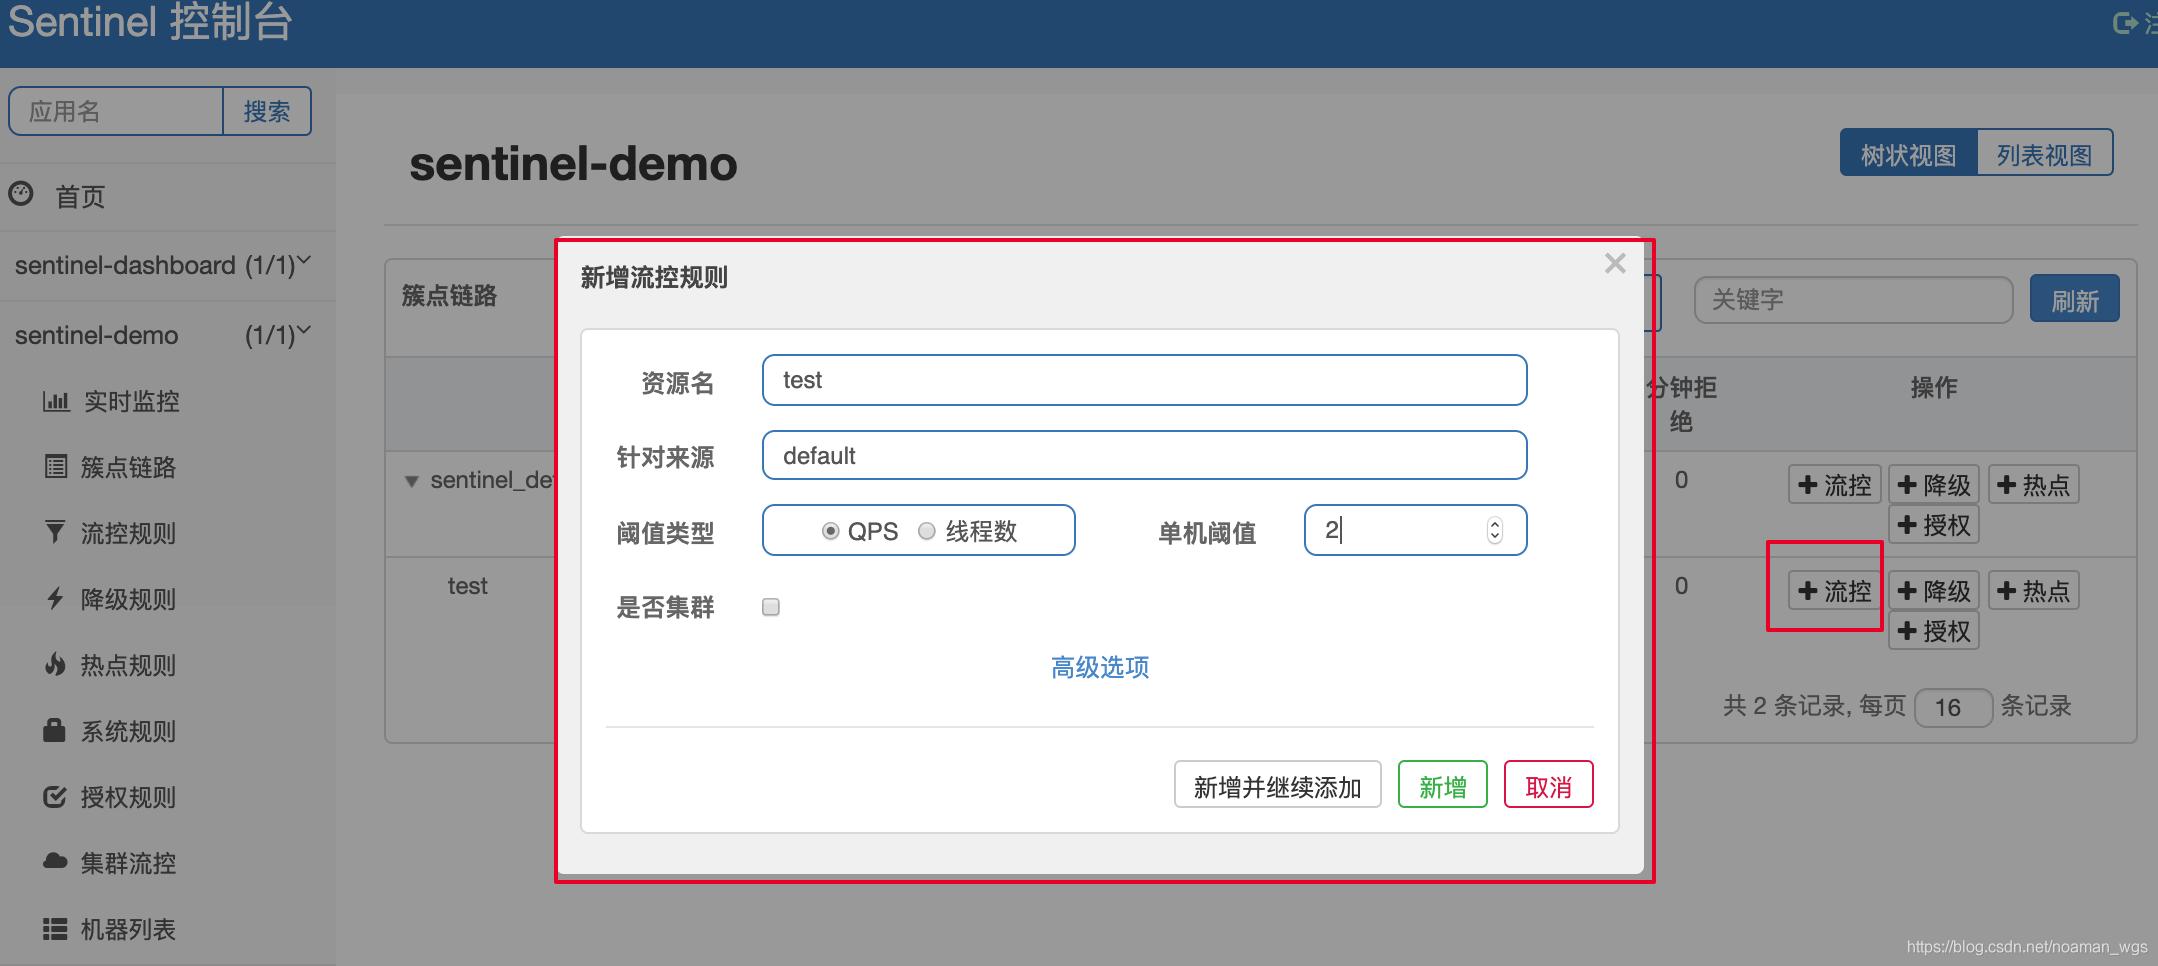 [外链图片转存失败,源站可能有防盗链机制,建议将图片保存下来直接上传(img-zMK2mbJt-1575117332208)(/Users/wanggenshen/Library/Application%20Support/typora-user-images/image-20191130201312578.png)]